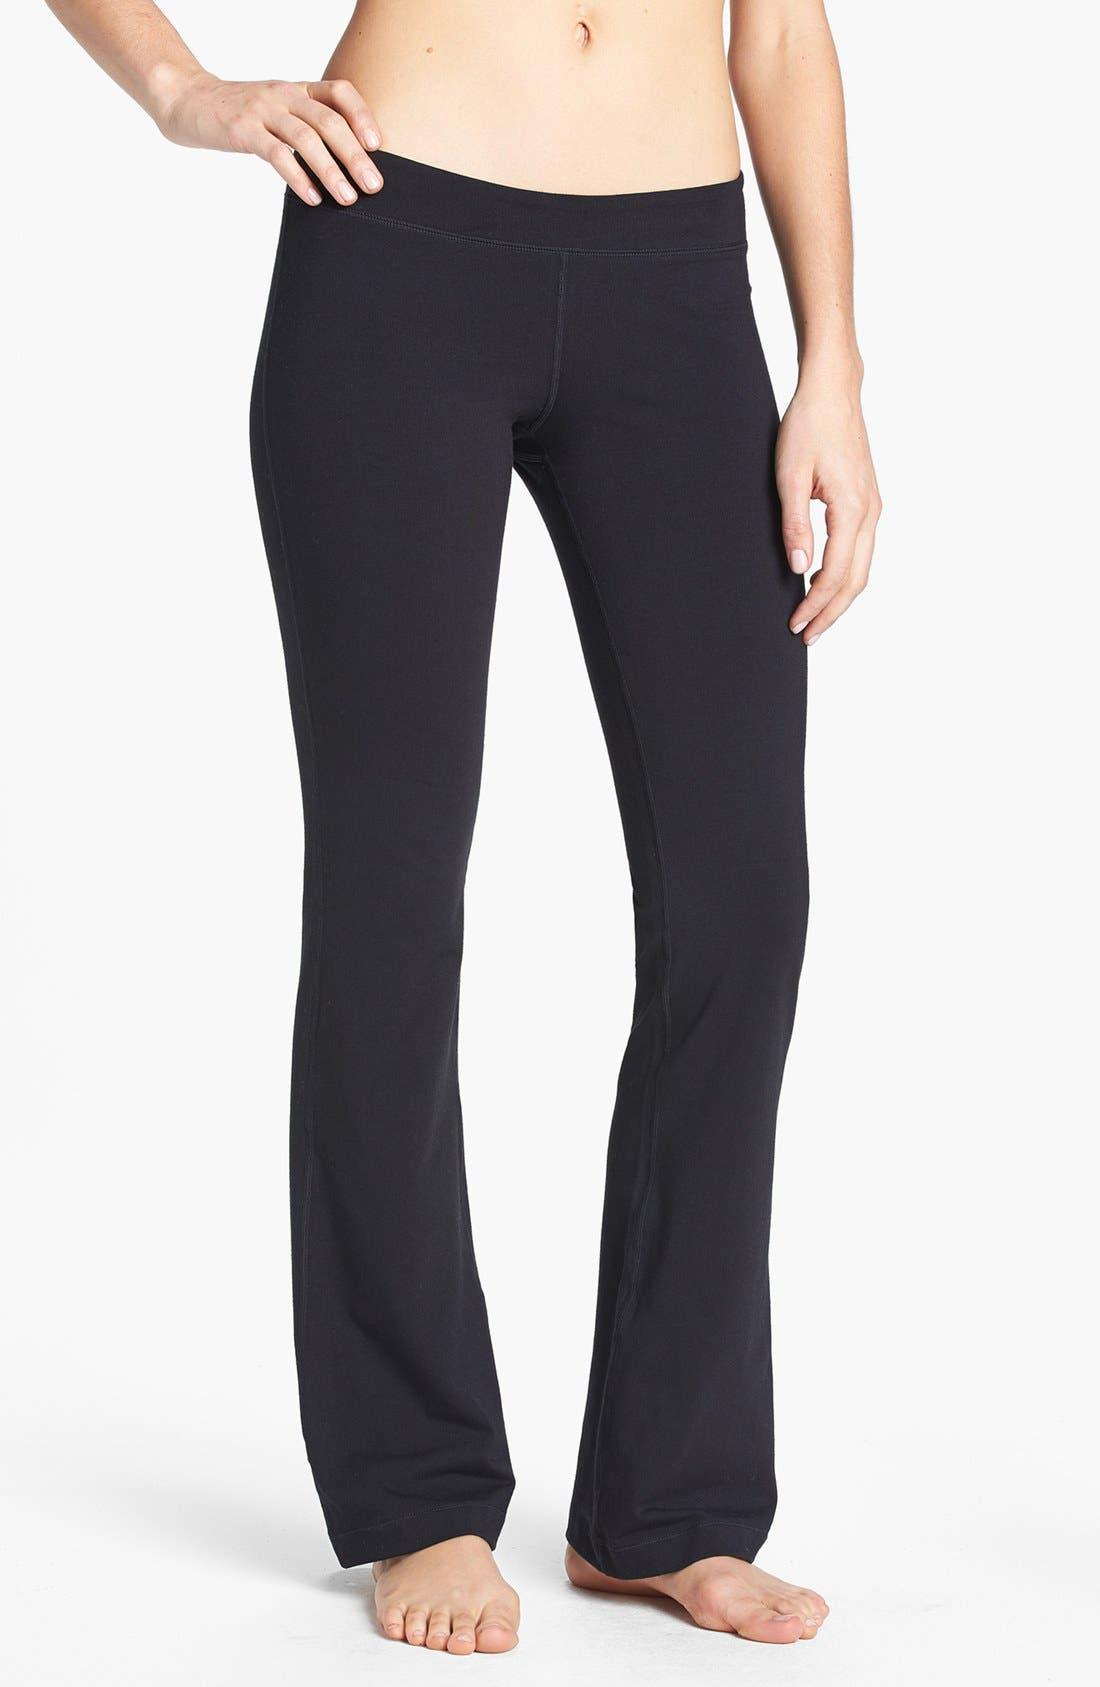 Alternate Image 1 Selected - Unit-Y Yoga Pants